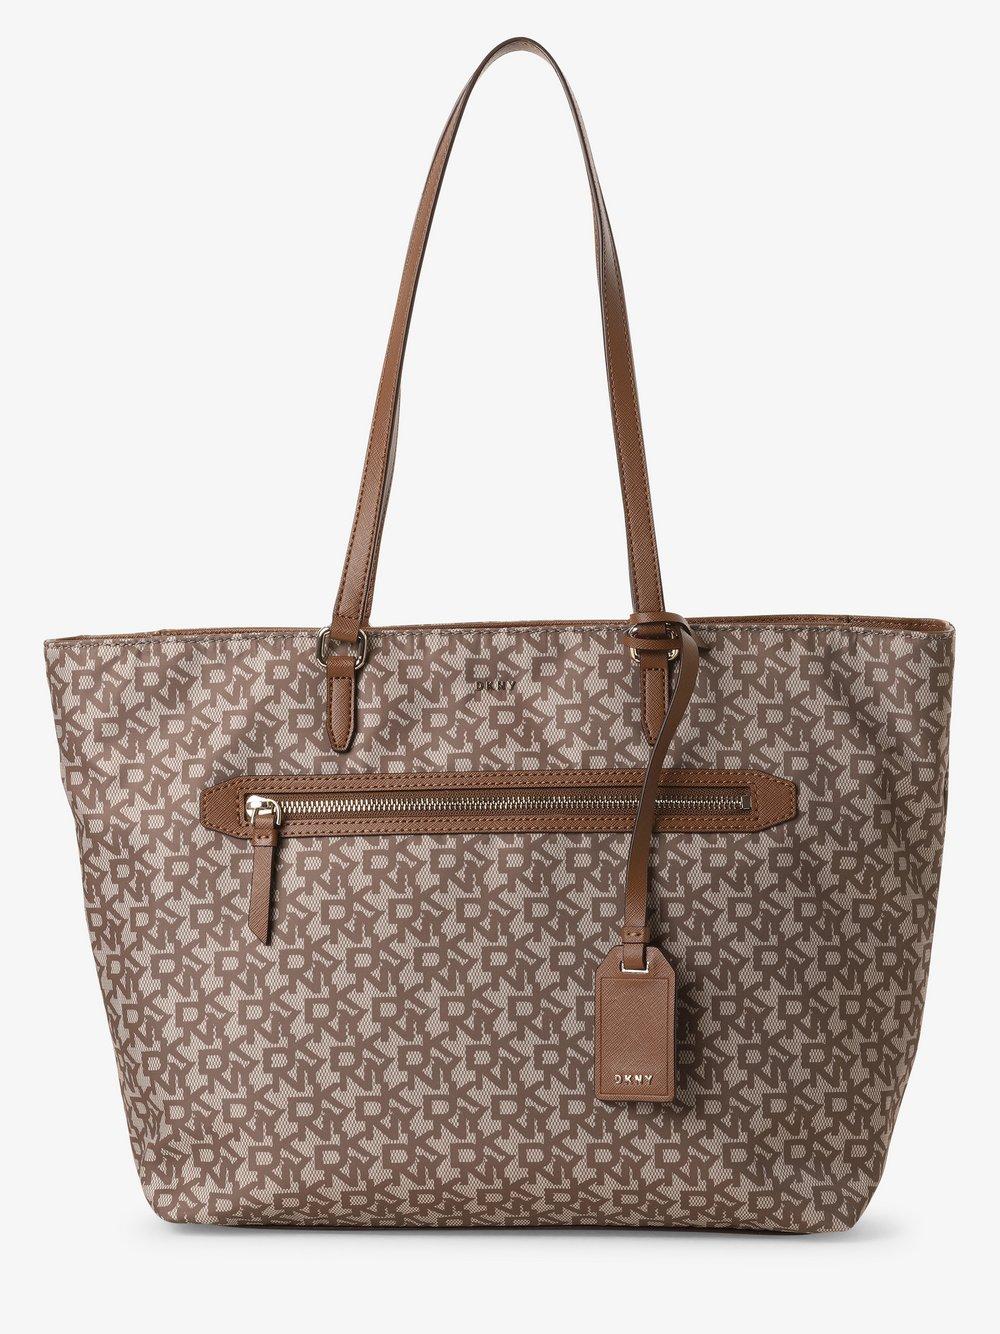 DKNY - Damska torba shopper, beżowy